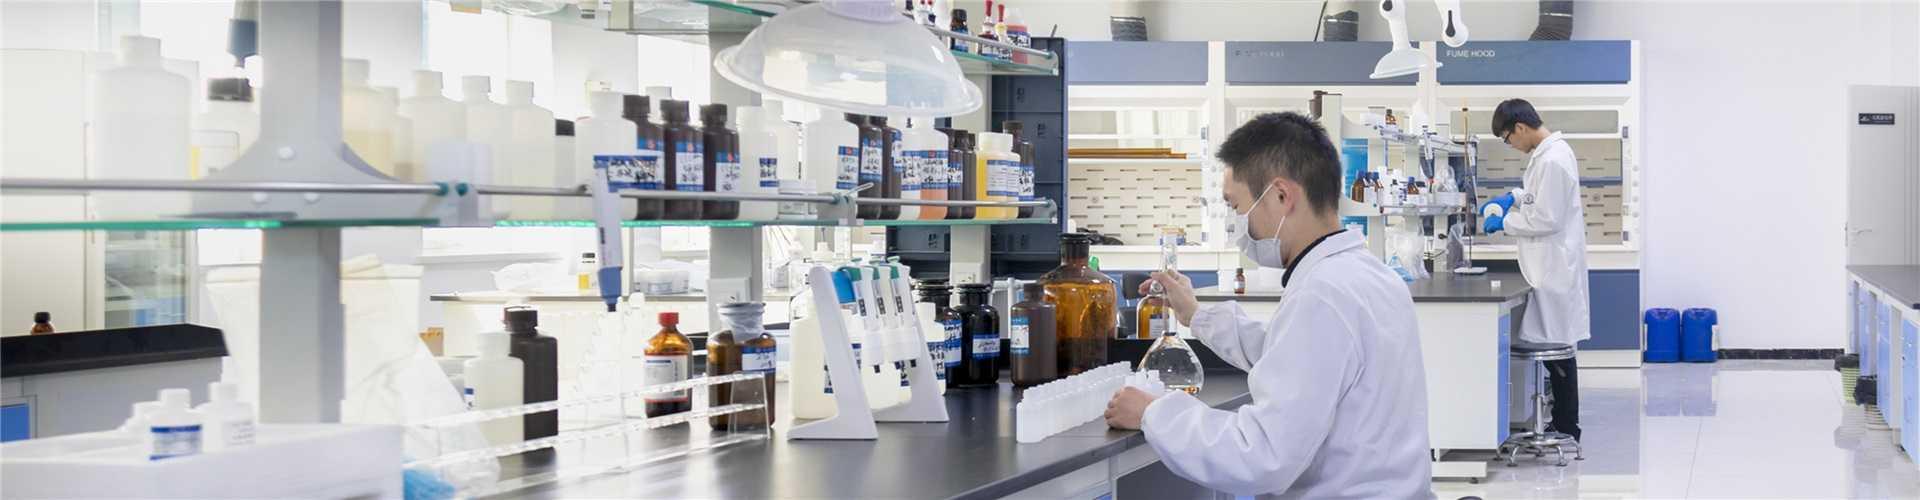 标准查询-产品与办事-tomyacoe.com国度标准物质网